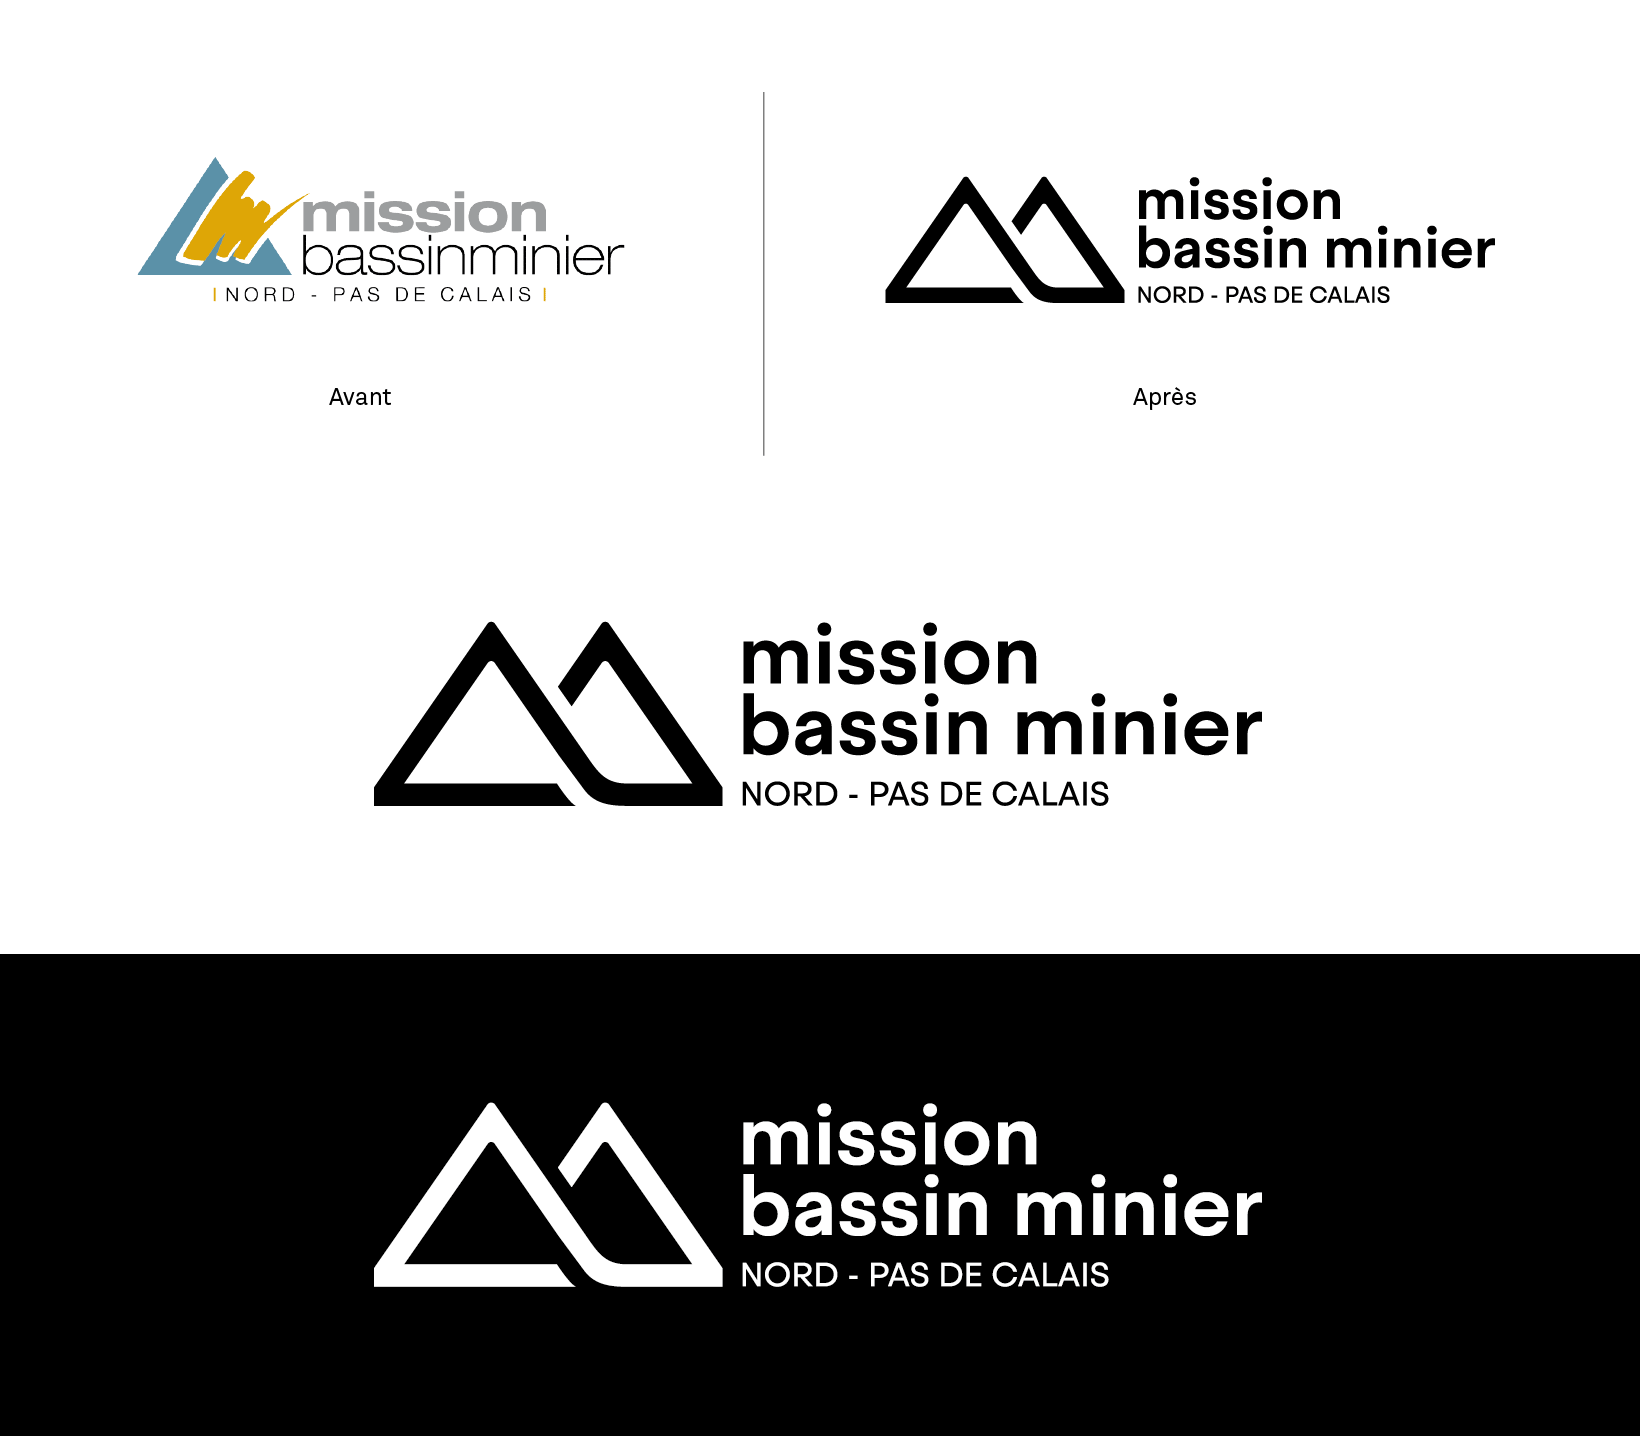 MissionBassinMinier-02